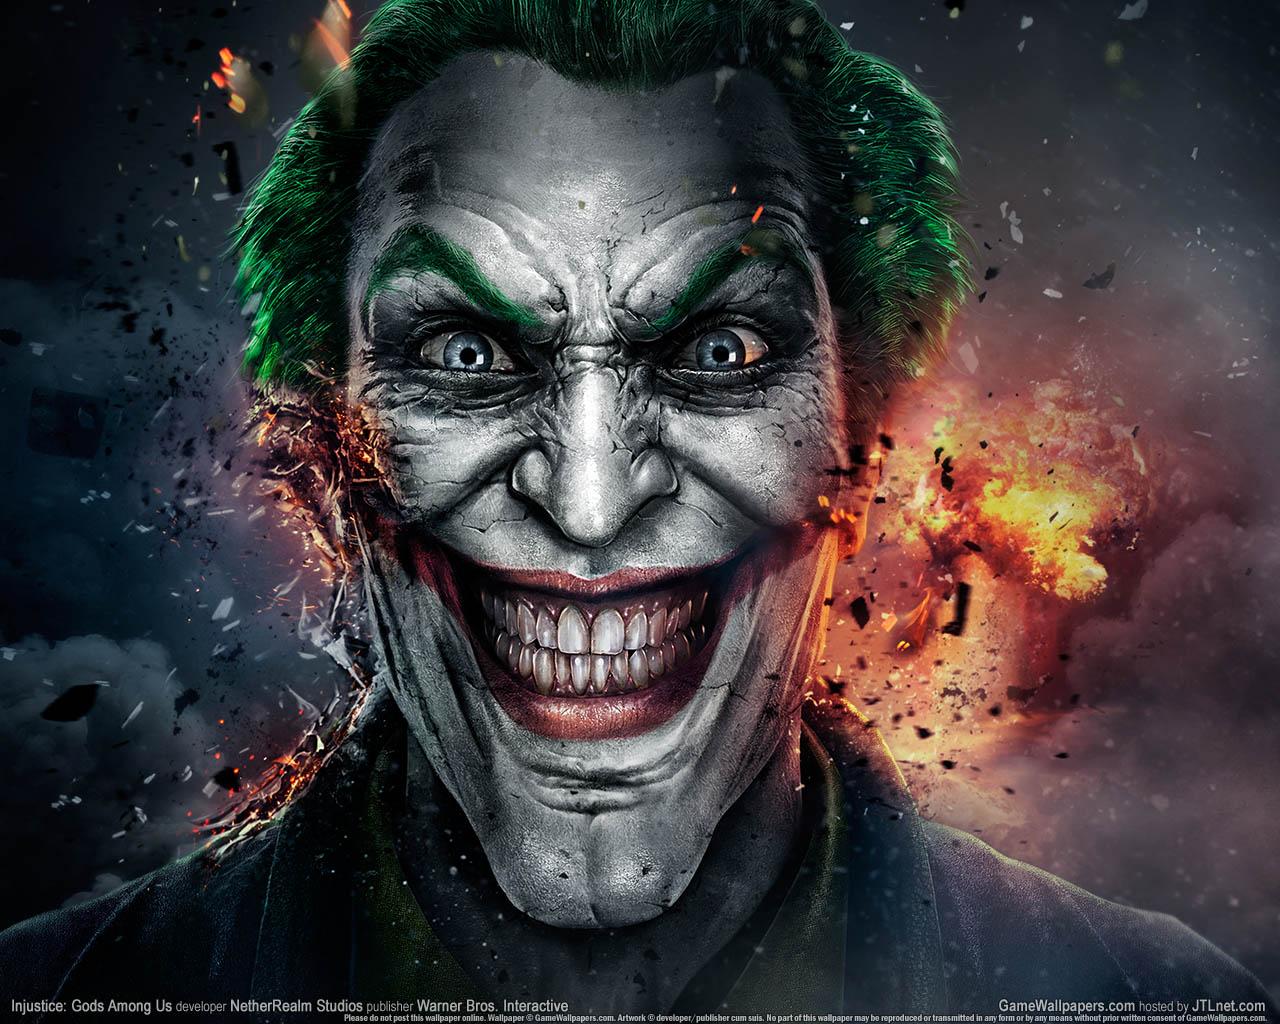 Injustice Gods Among Us Joker